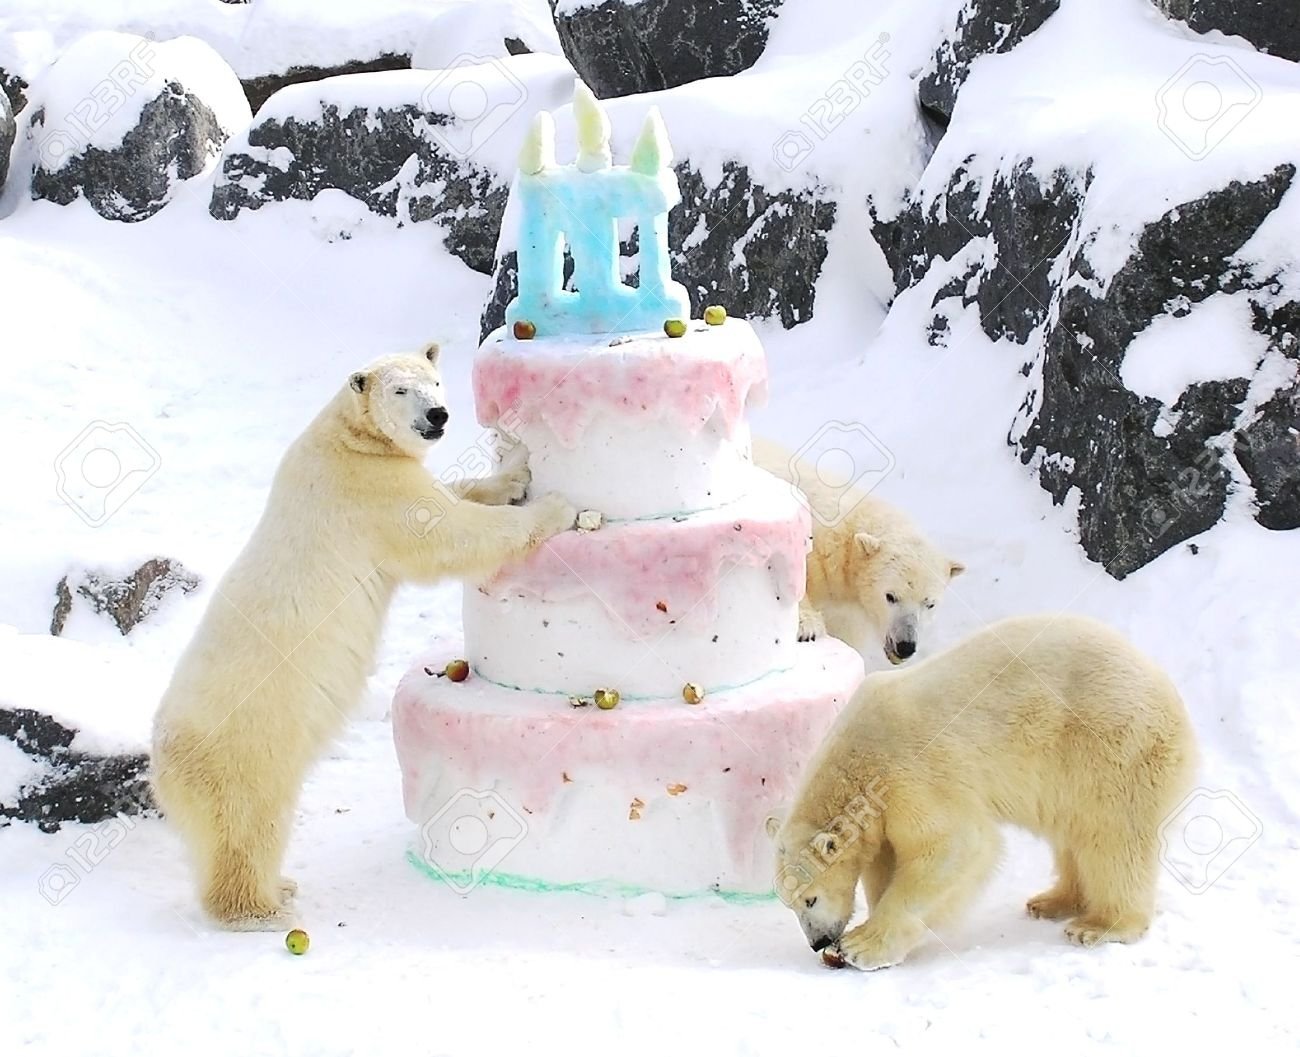 Amazing Three Polar Bears Celebrating Their Birthday With A Giant Cake Funny Birthday Cards Online Elaedamsfinfo